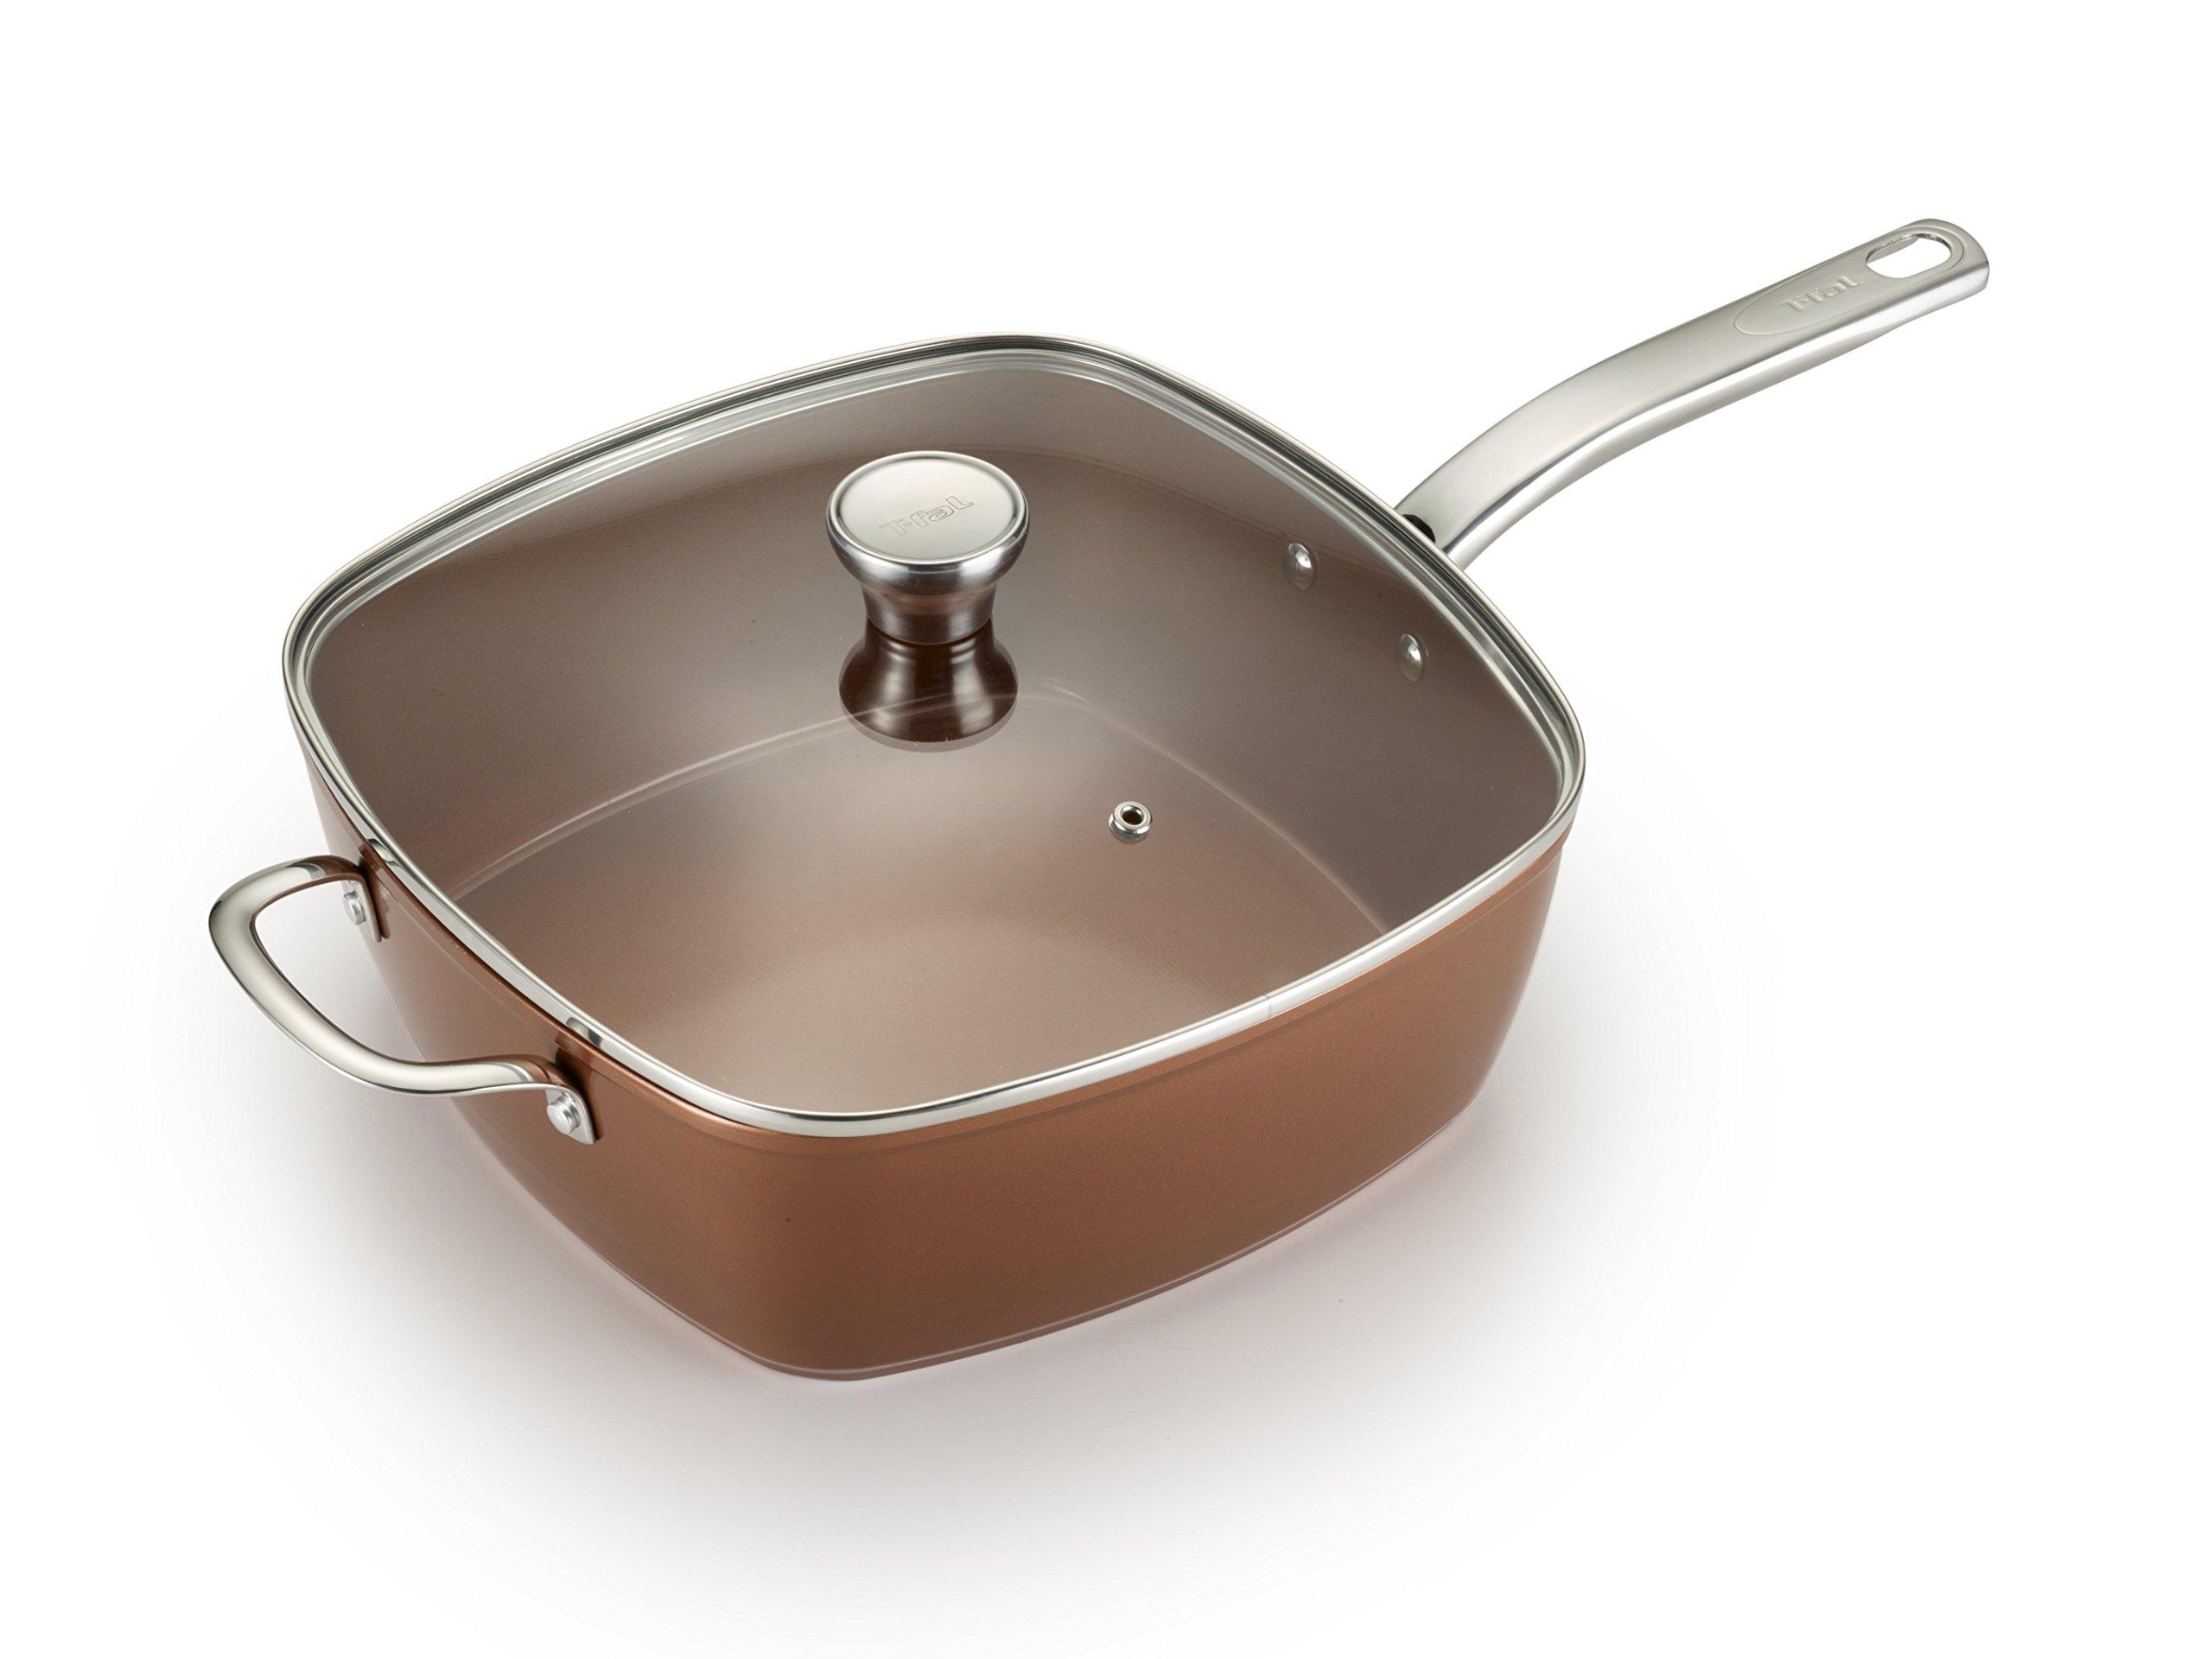 T-fal C4119564 Copper Ceramic Nonstick Dishwasher Safe Oven Safe Cookware Saute Pan Square Pan, 7-Quart, Copper